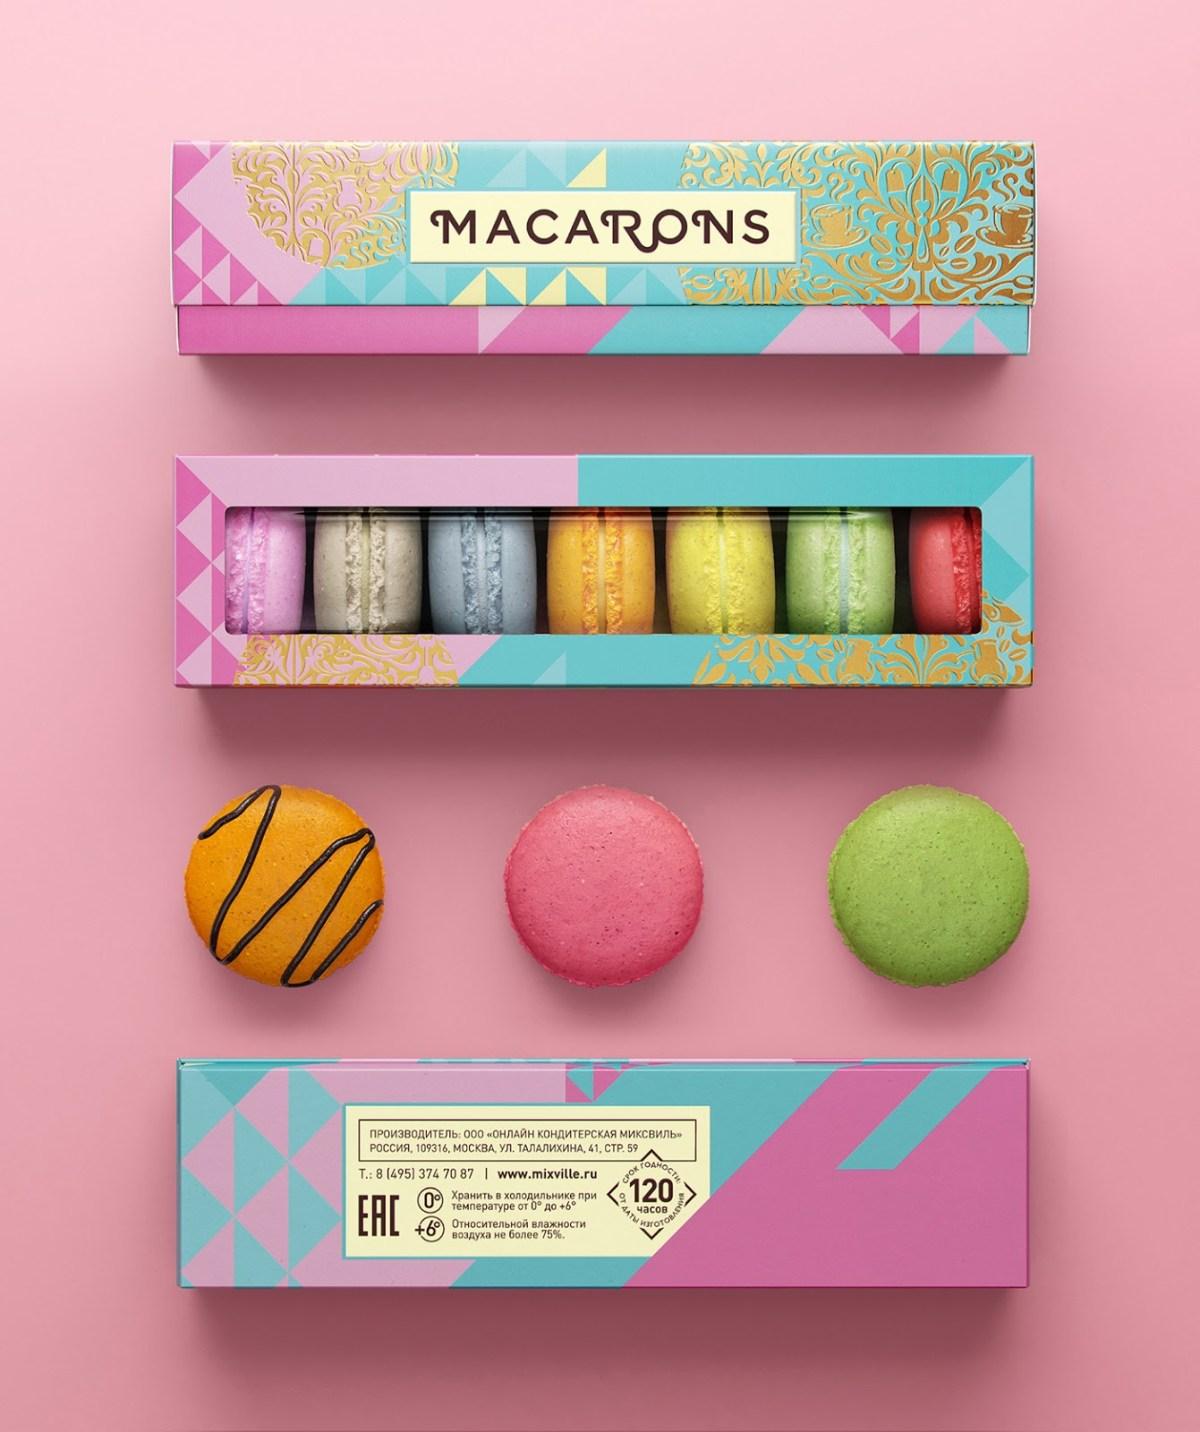 macarons-01